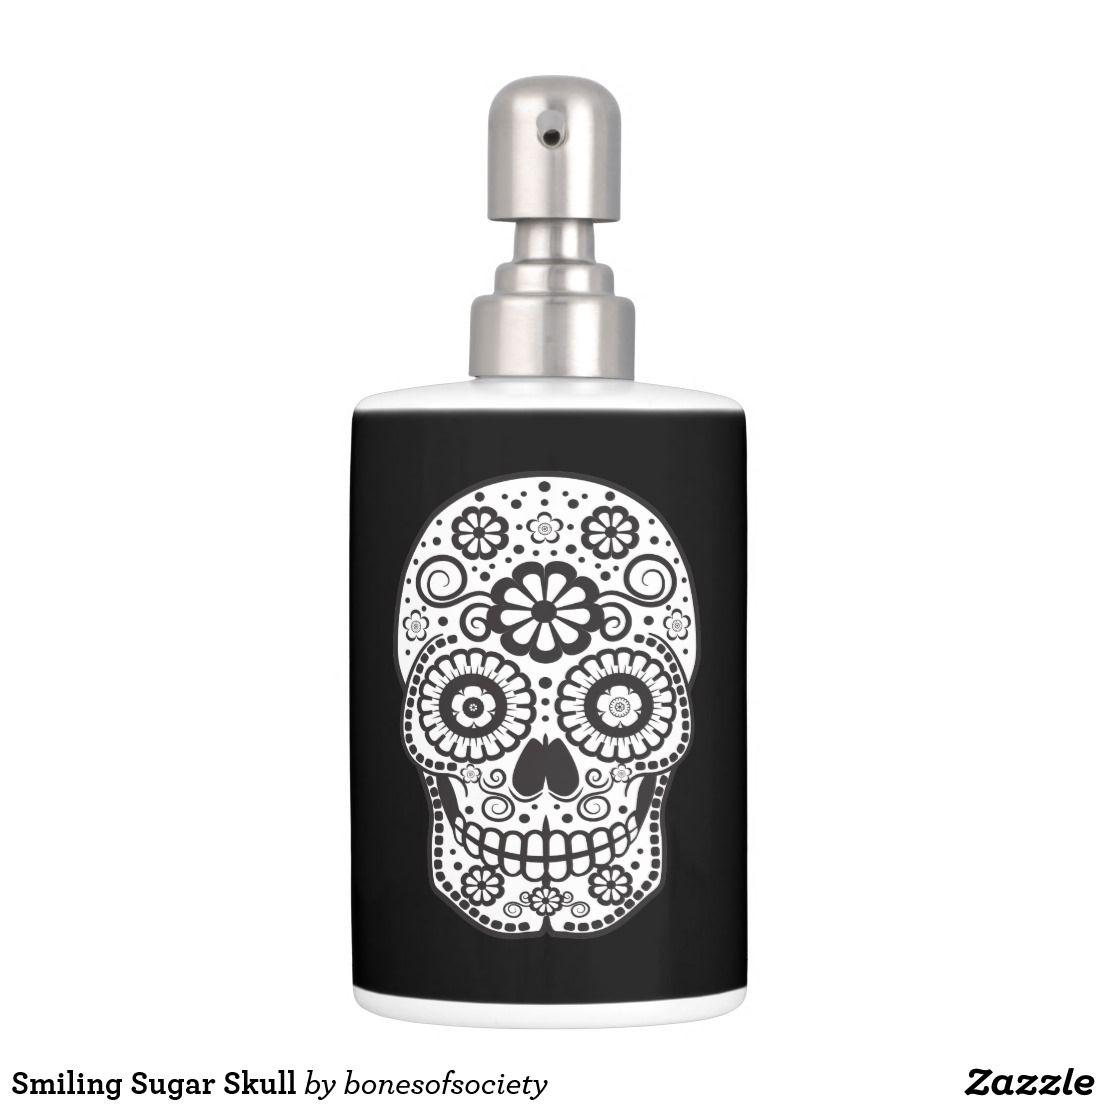 Smiling Sugar Skull Bathroom Set Zazzle Com Bathroom Sets Bath Accessories Set Sugar Skull